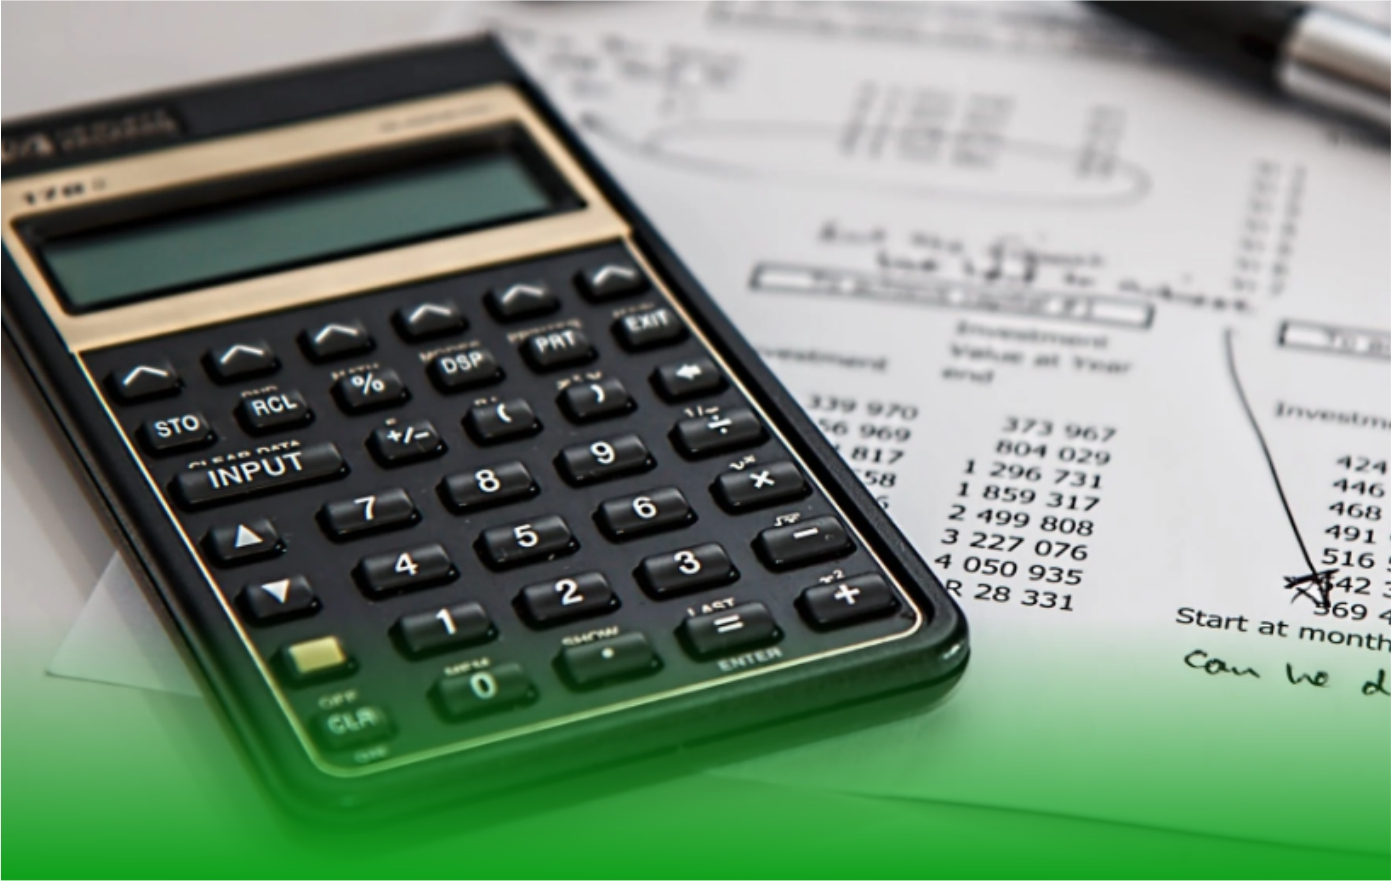 9 Cara Mengatur Keuangan Usaha Dagang Kecil Dan Menengah Dengan Benar